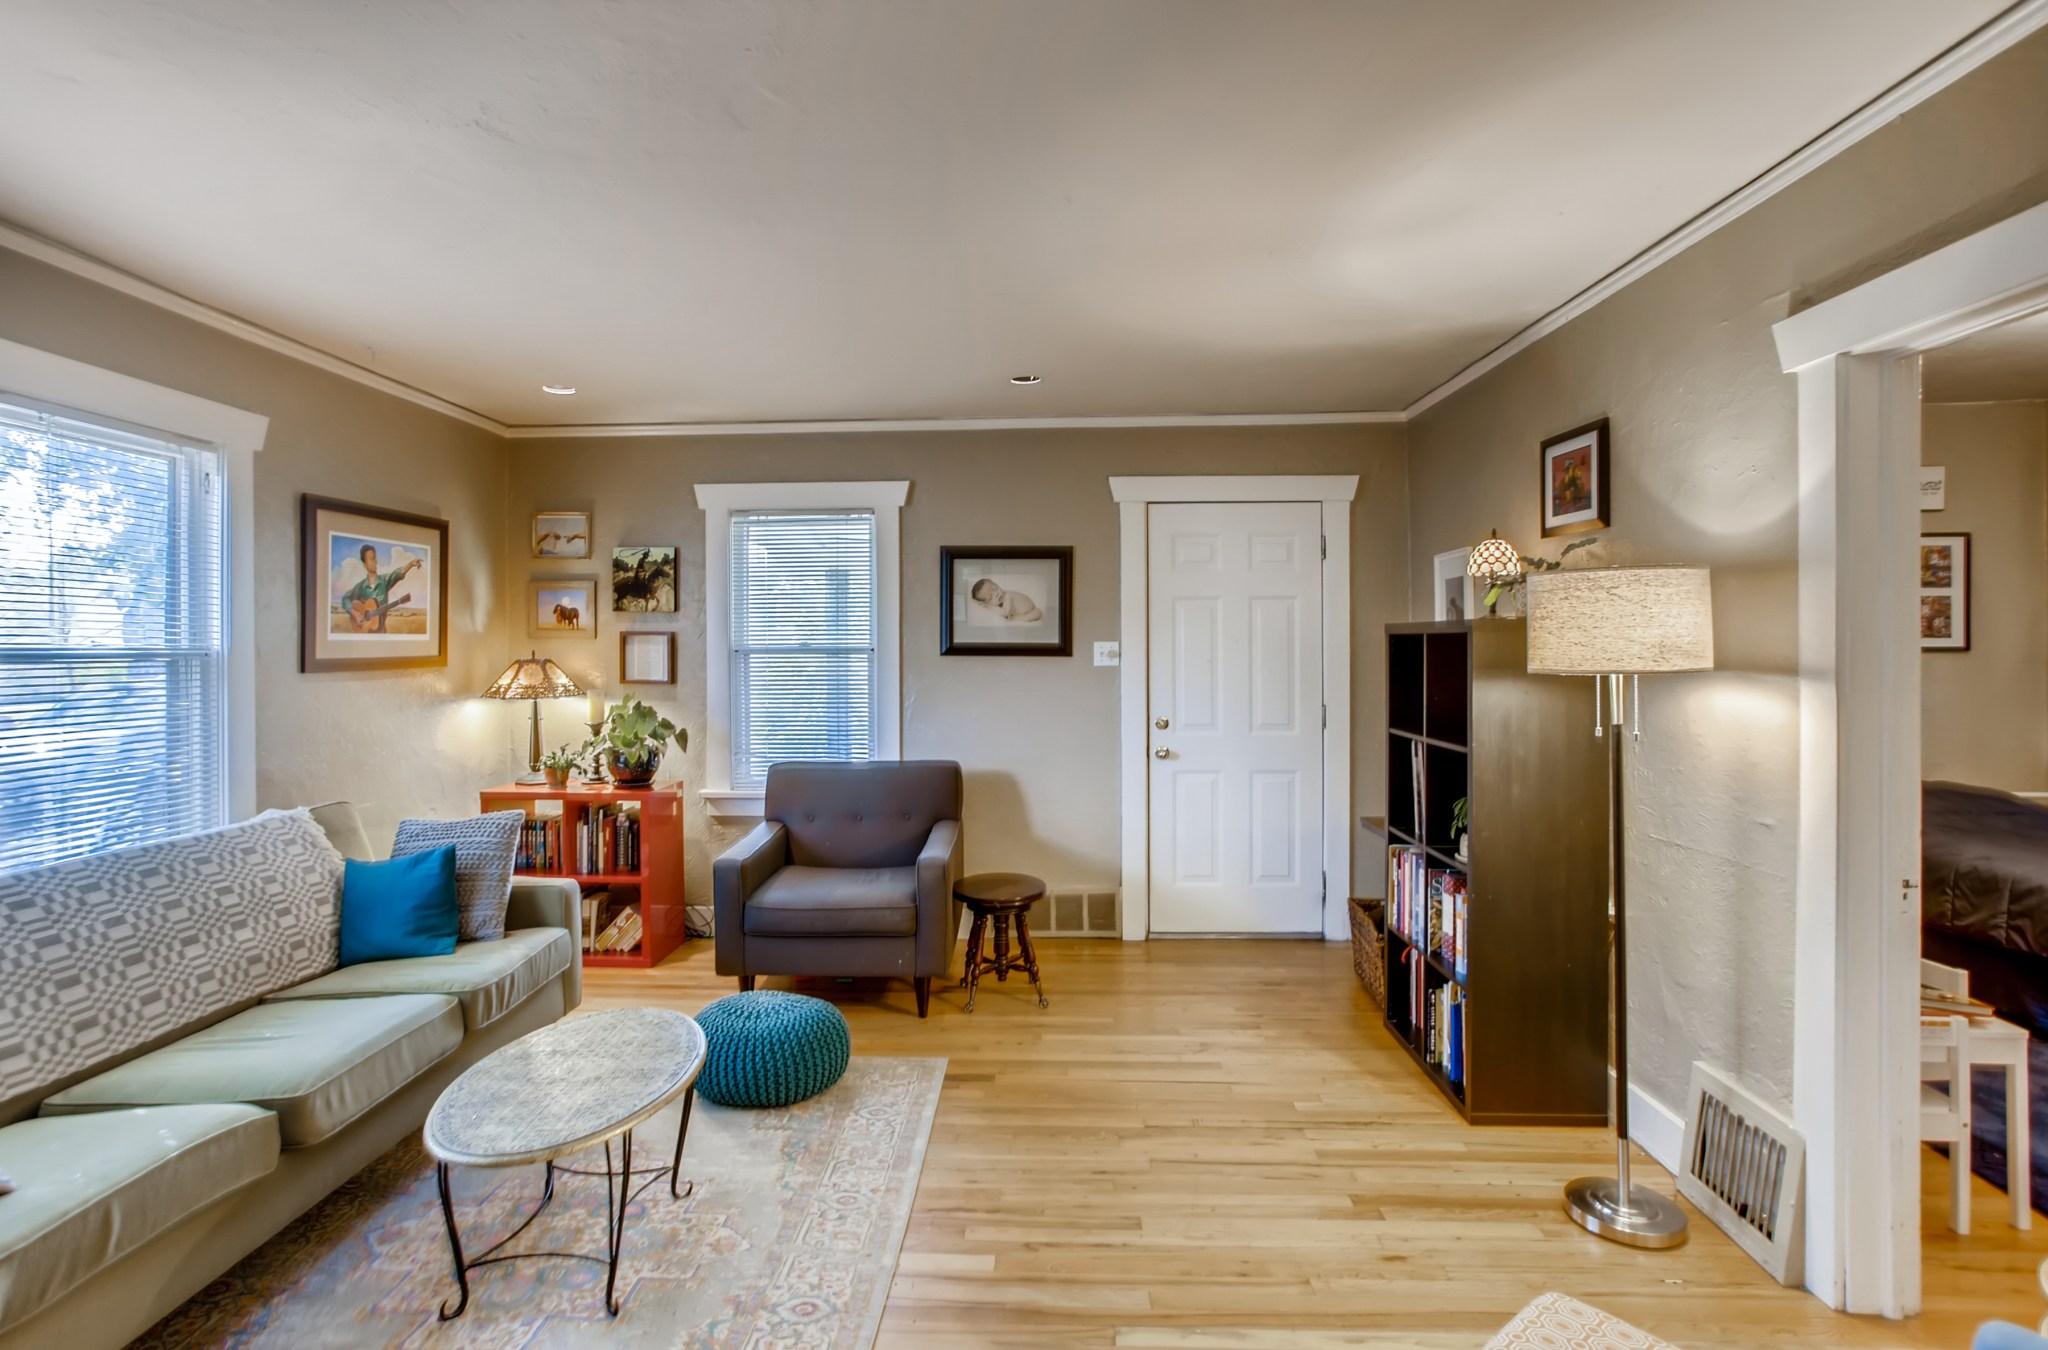 15-Family-Room